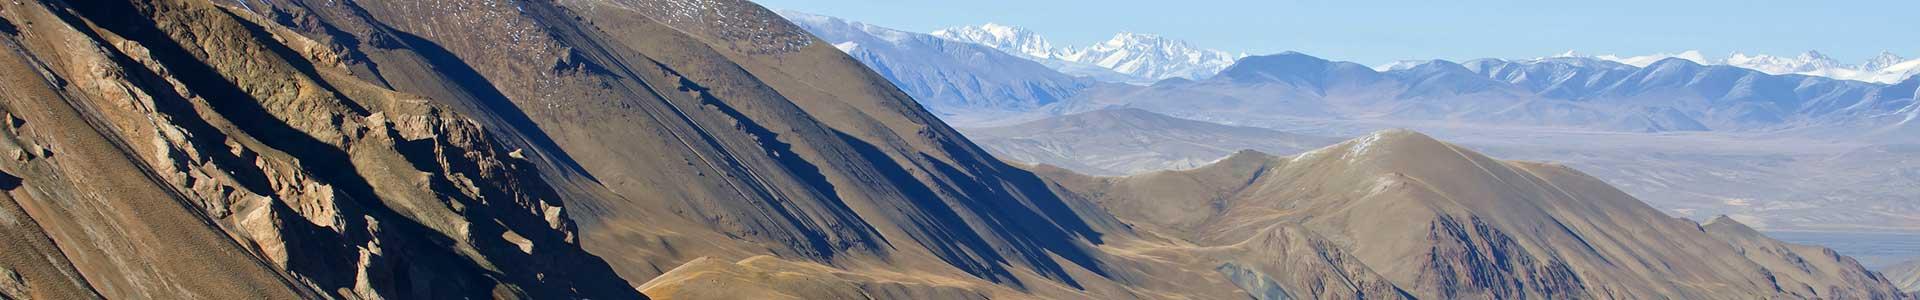 Voyage au Kirghizistan - TUI